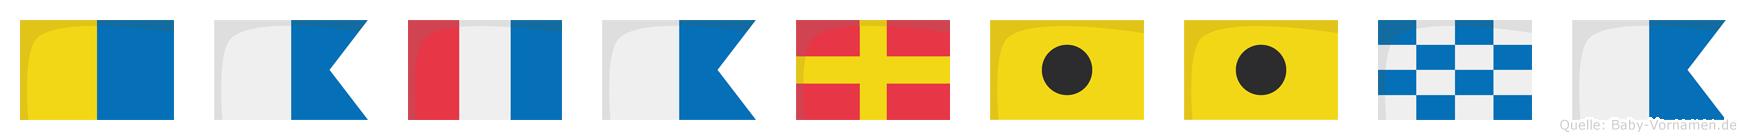 Katariina im Flaggenalphabet